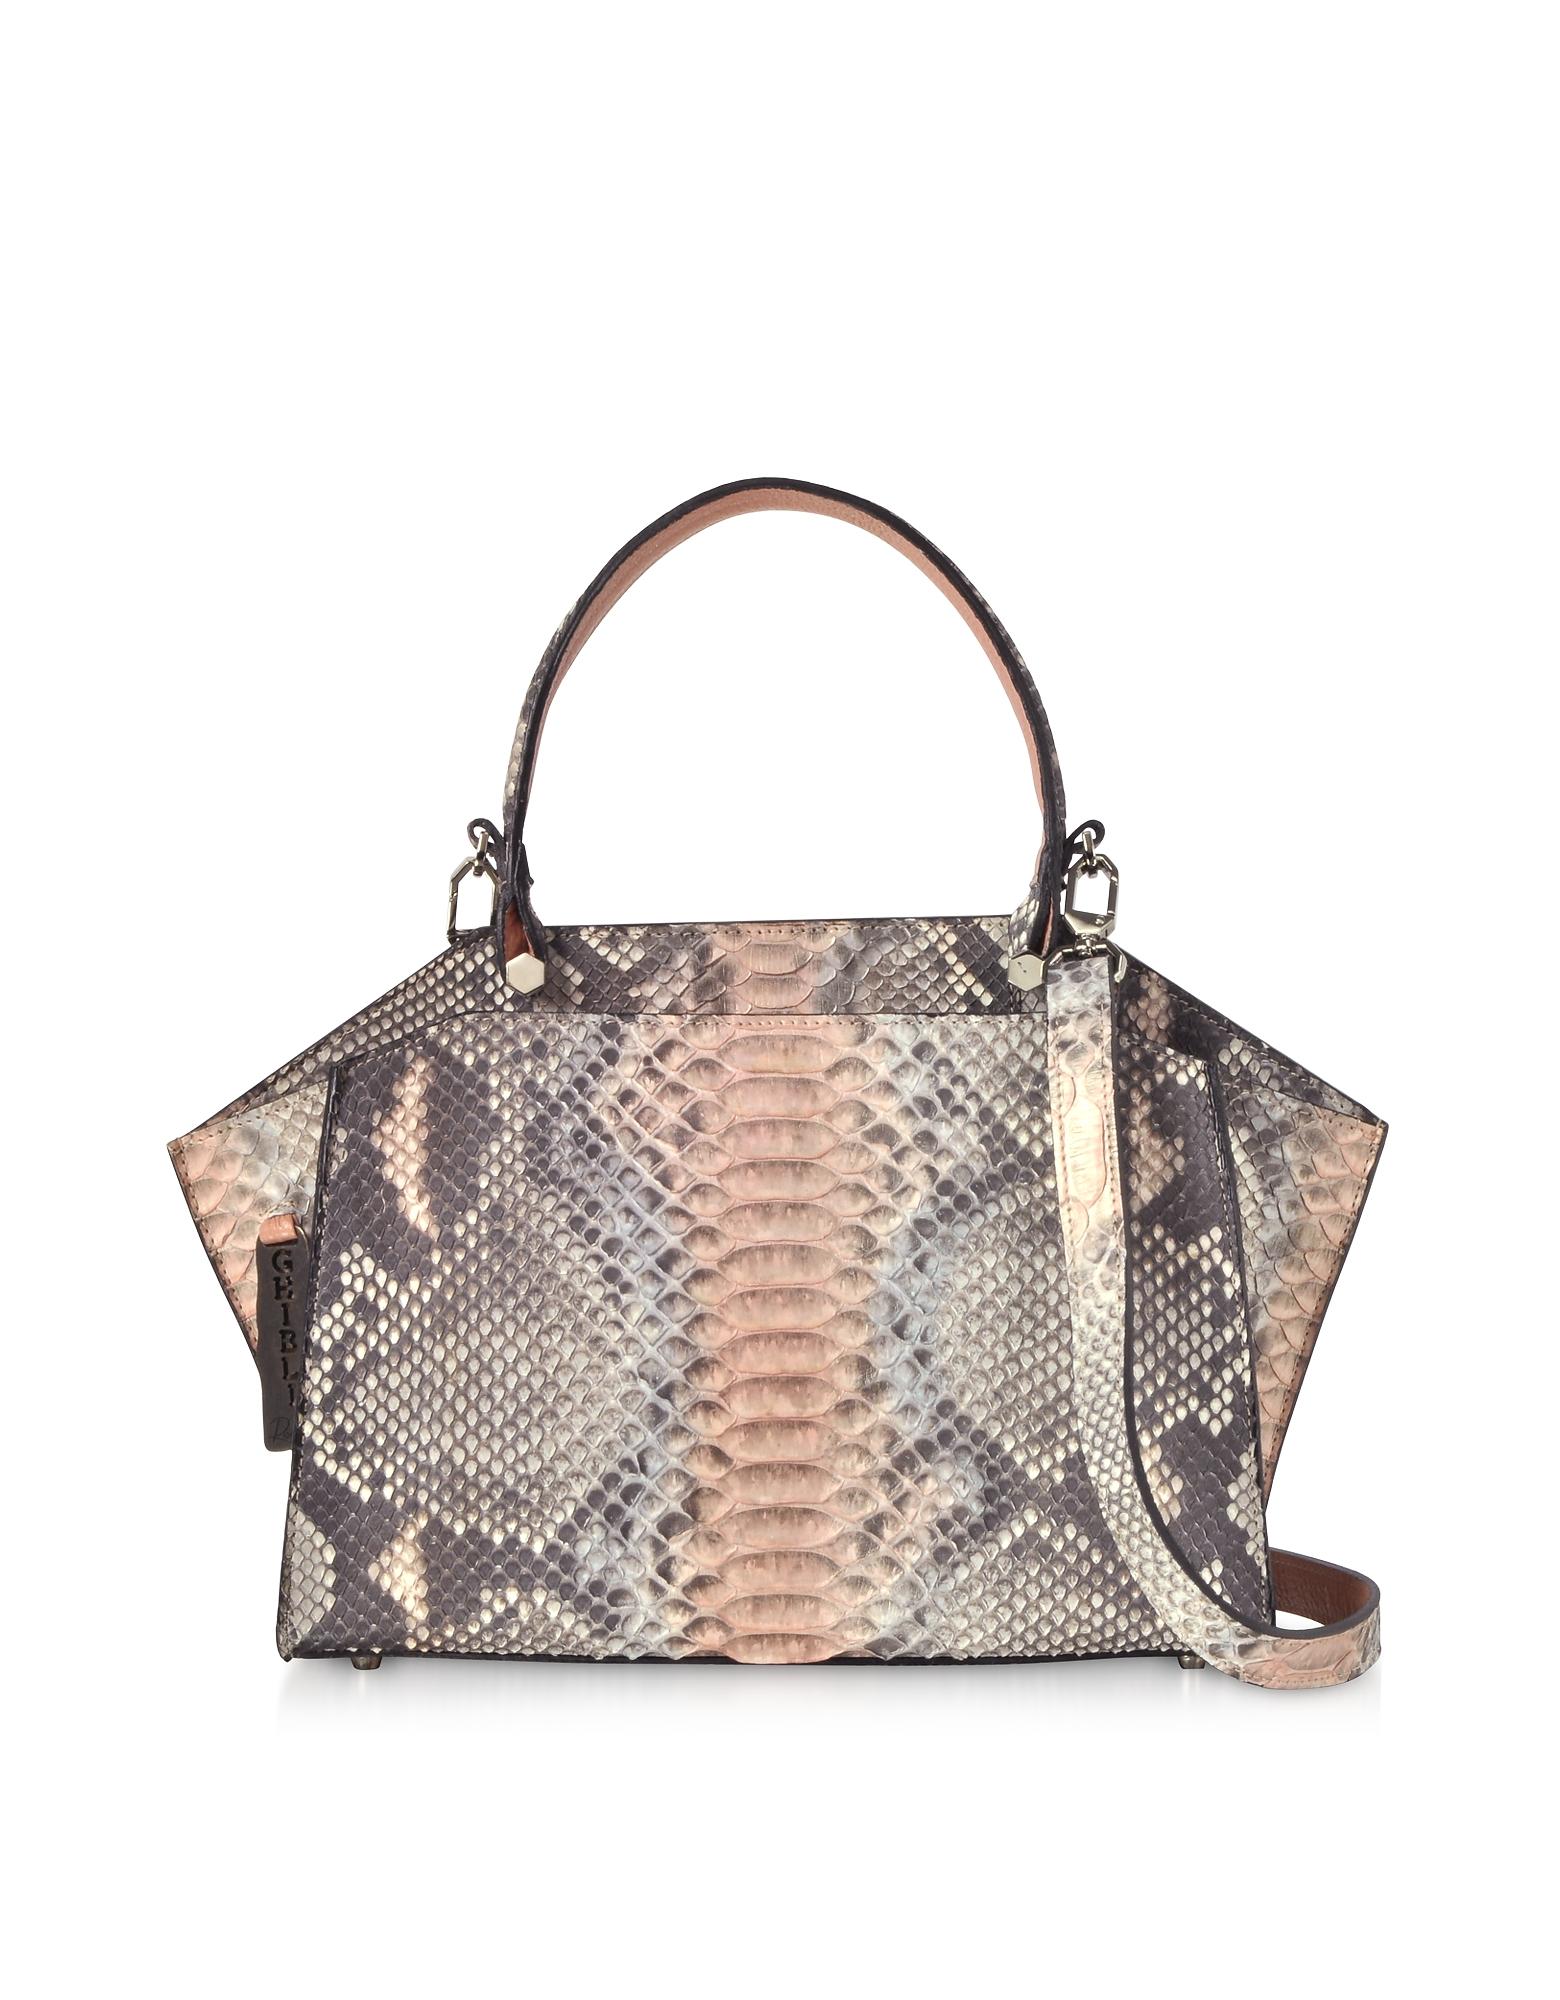 Ghibli Handbags, Pearl Gray and Pale Pink Python Leather Top Handle Satchel Bag